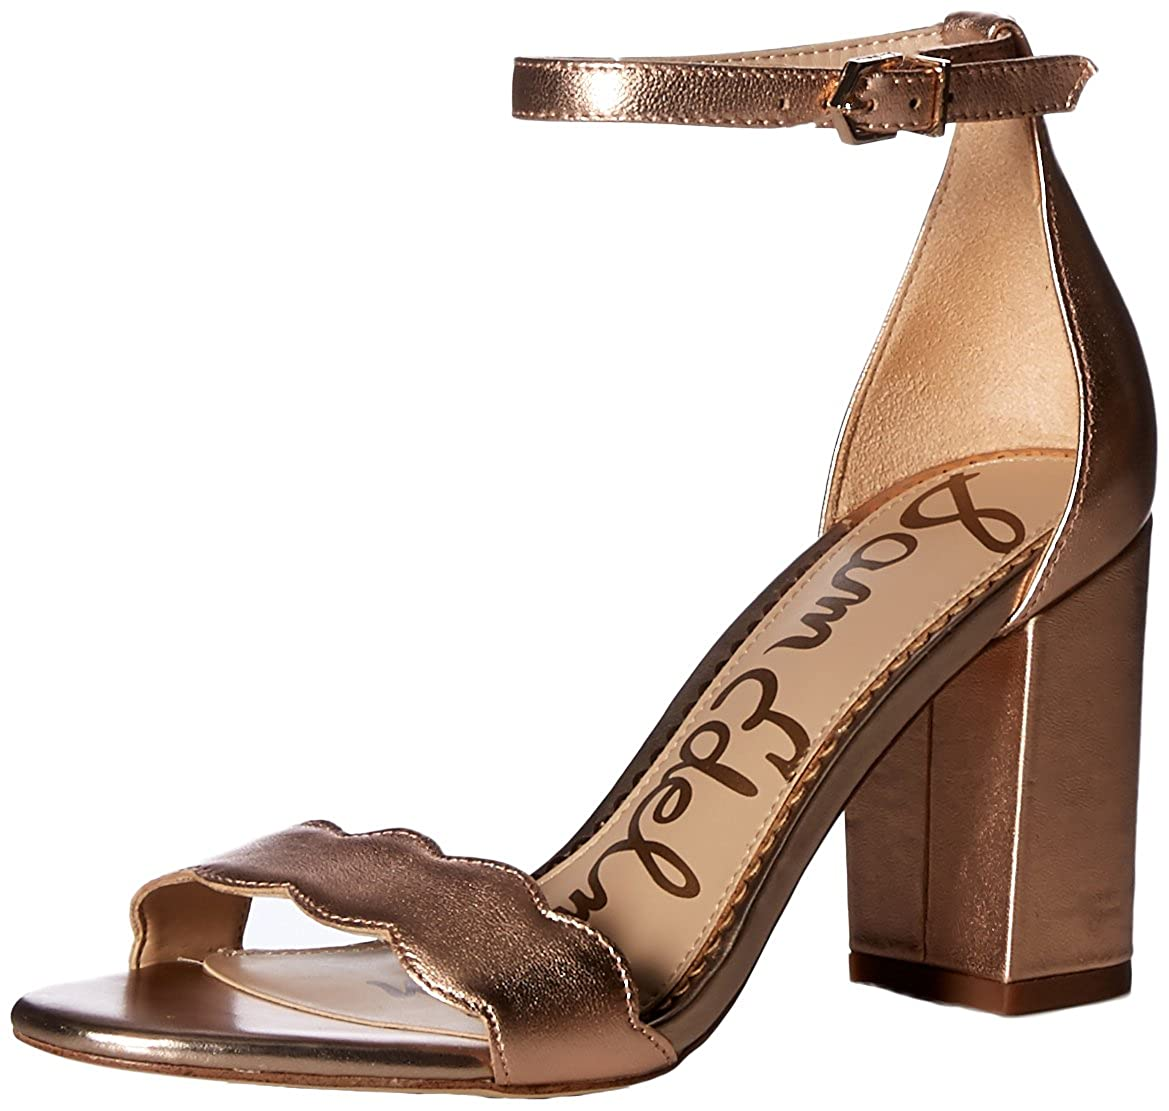 bluesh gold Metallic Leather Sam Edelman Women's Odila Fashion Sandals